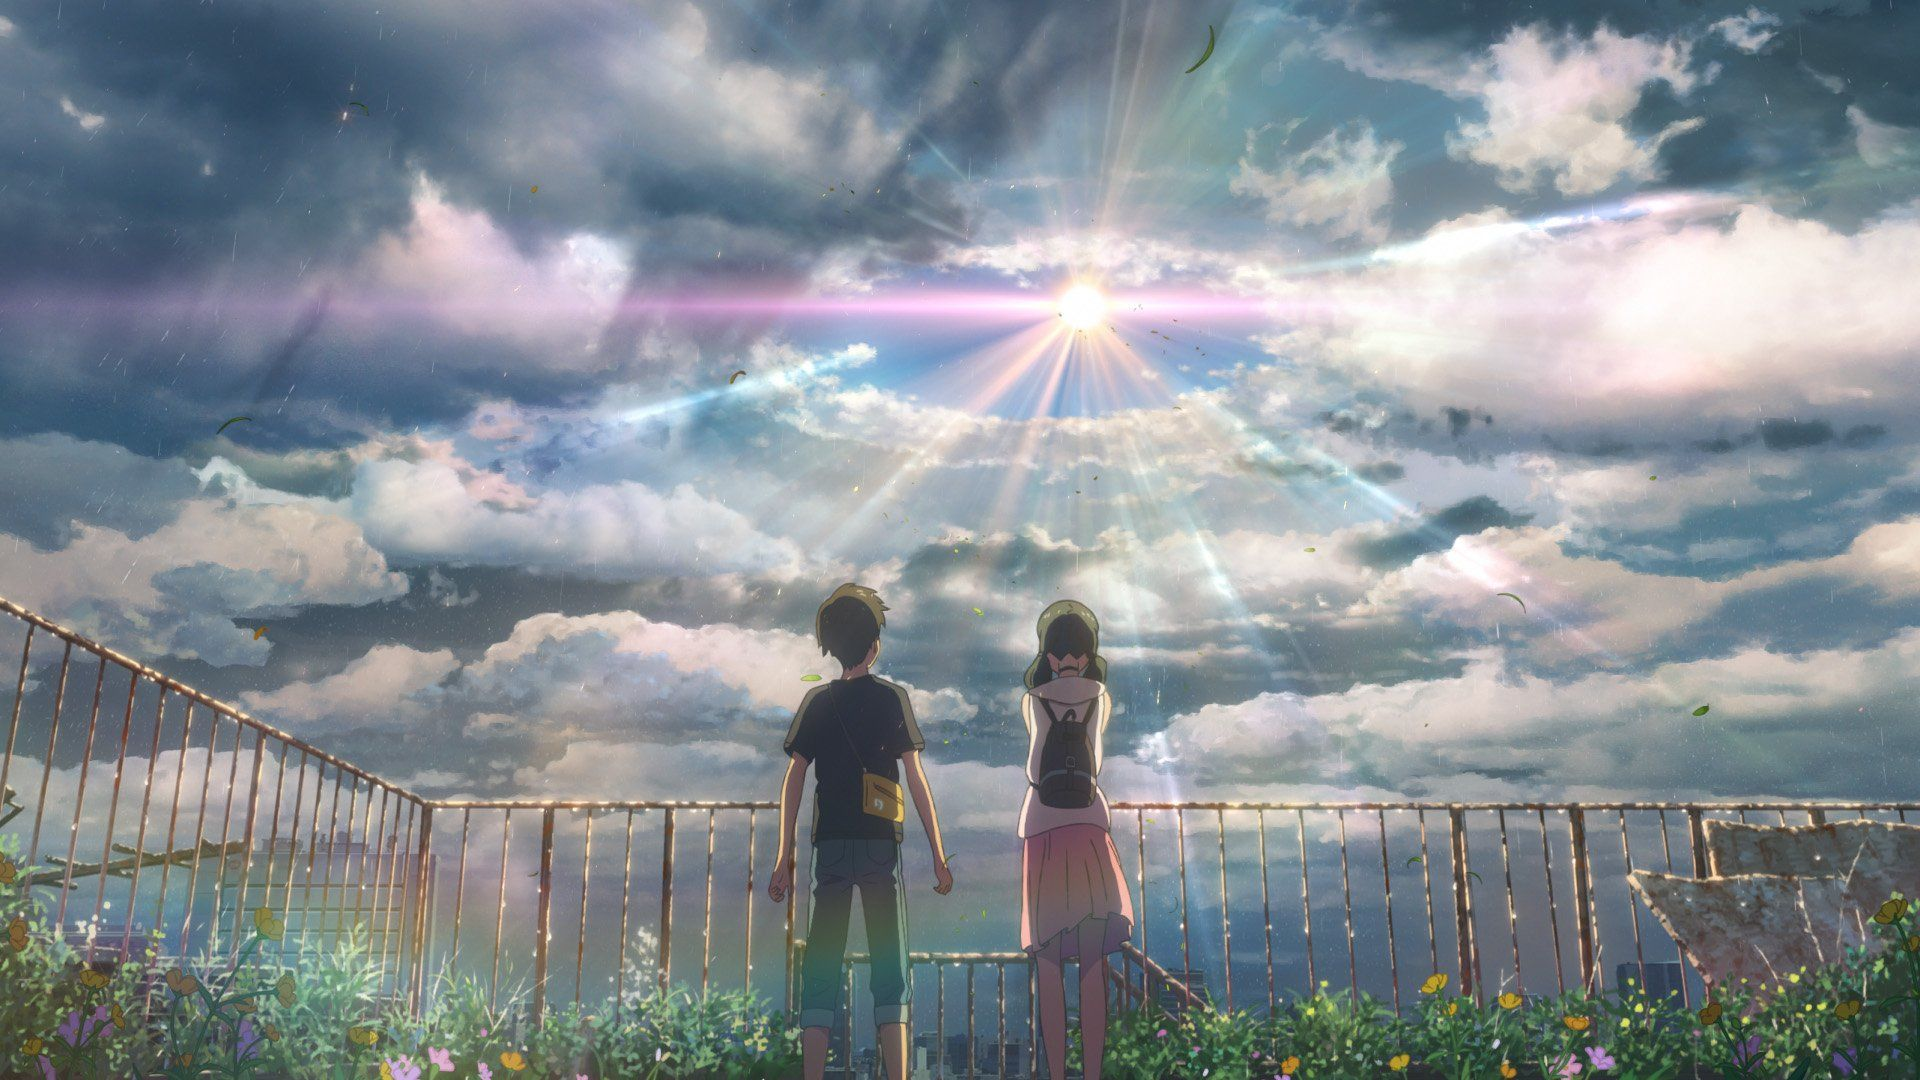 Makoto Shinkai S Your Name Newest Film Weathering With You Has Brand New Visuals Anime Scenery Makoto Shinkai Movies Anime Wallpaper